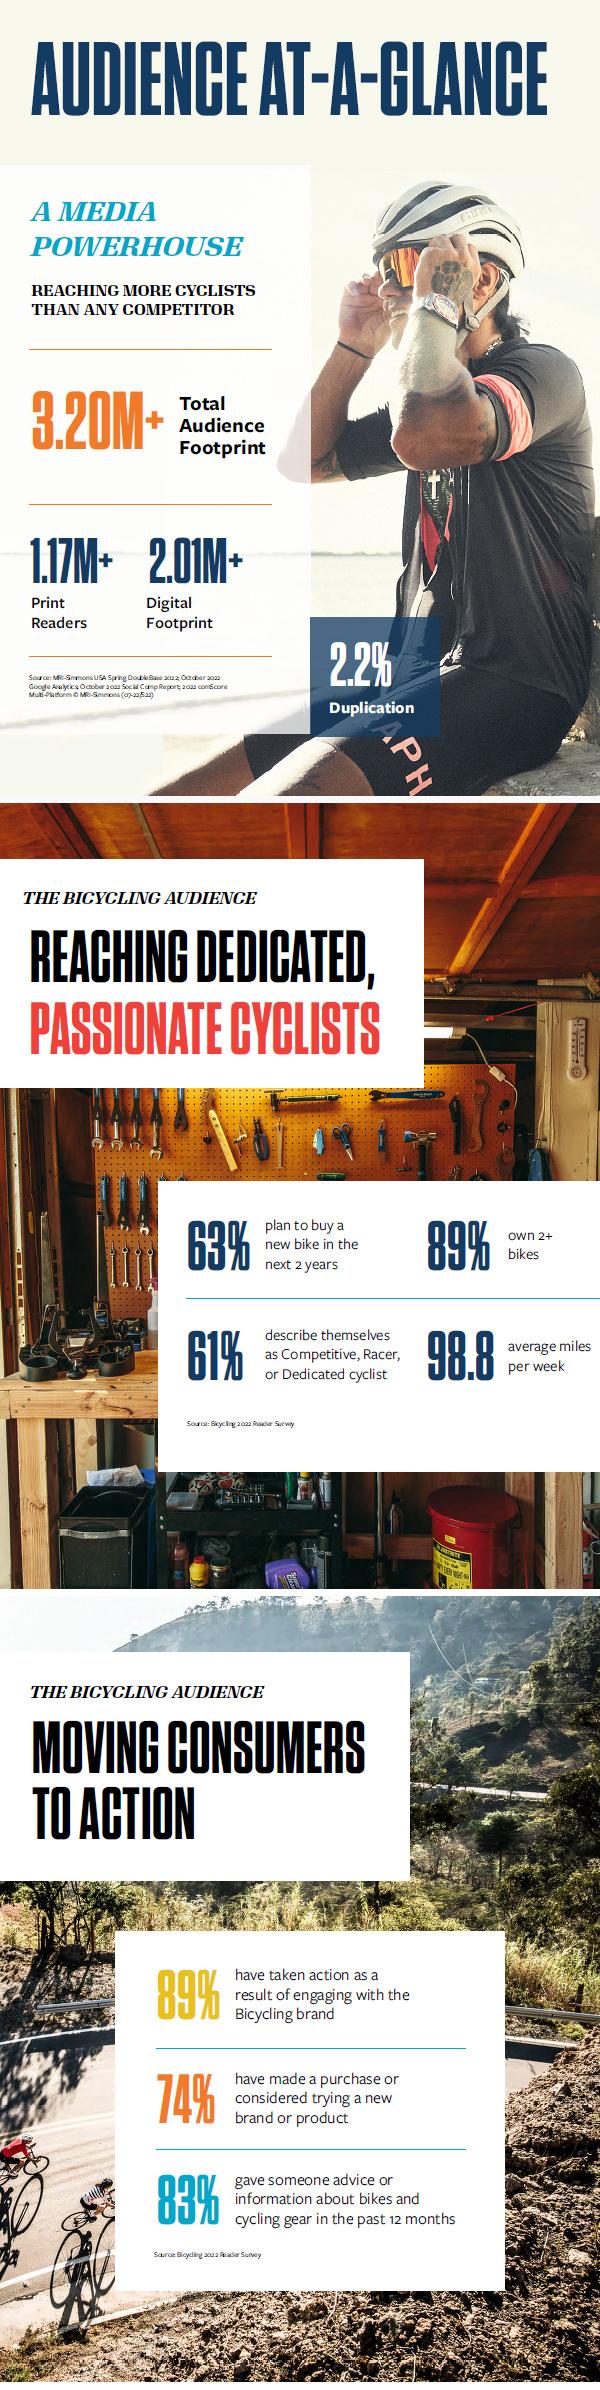 At A Glance - Bicycling Magazine Media Kit